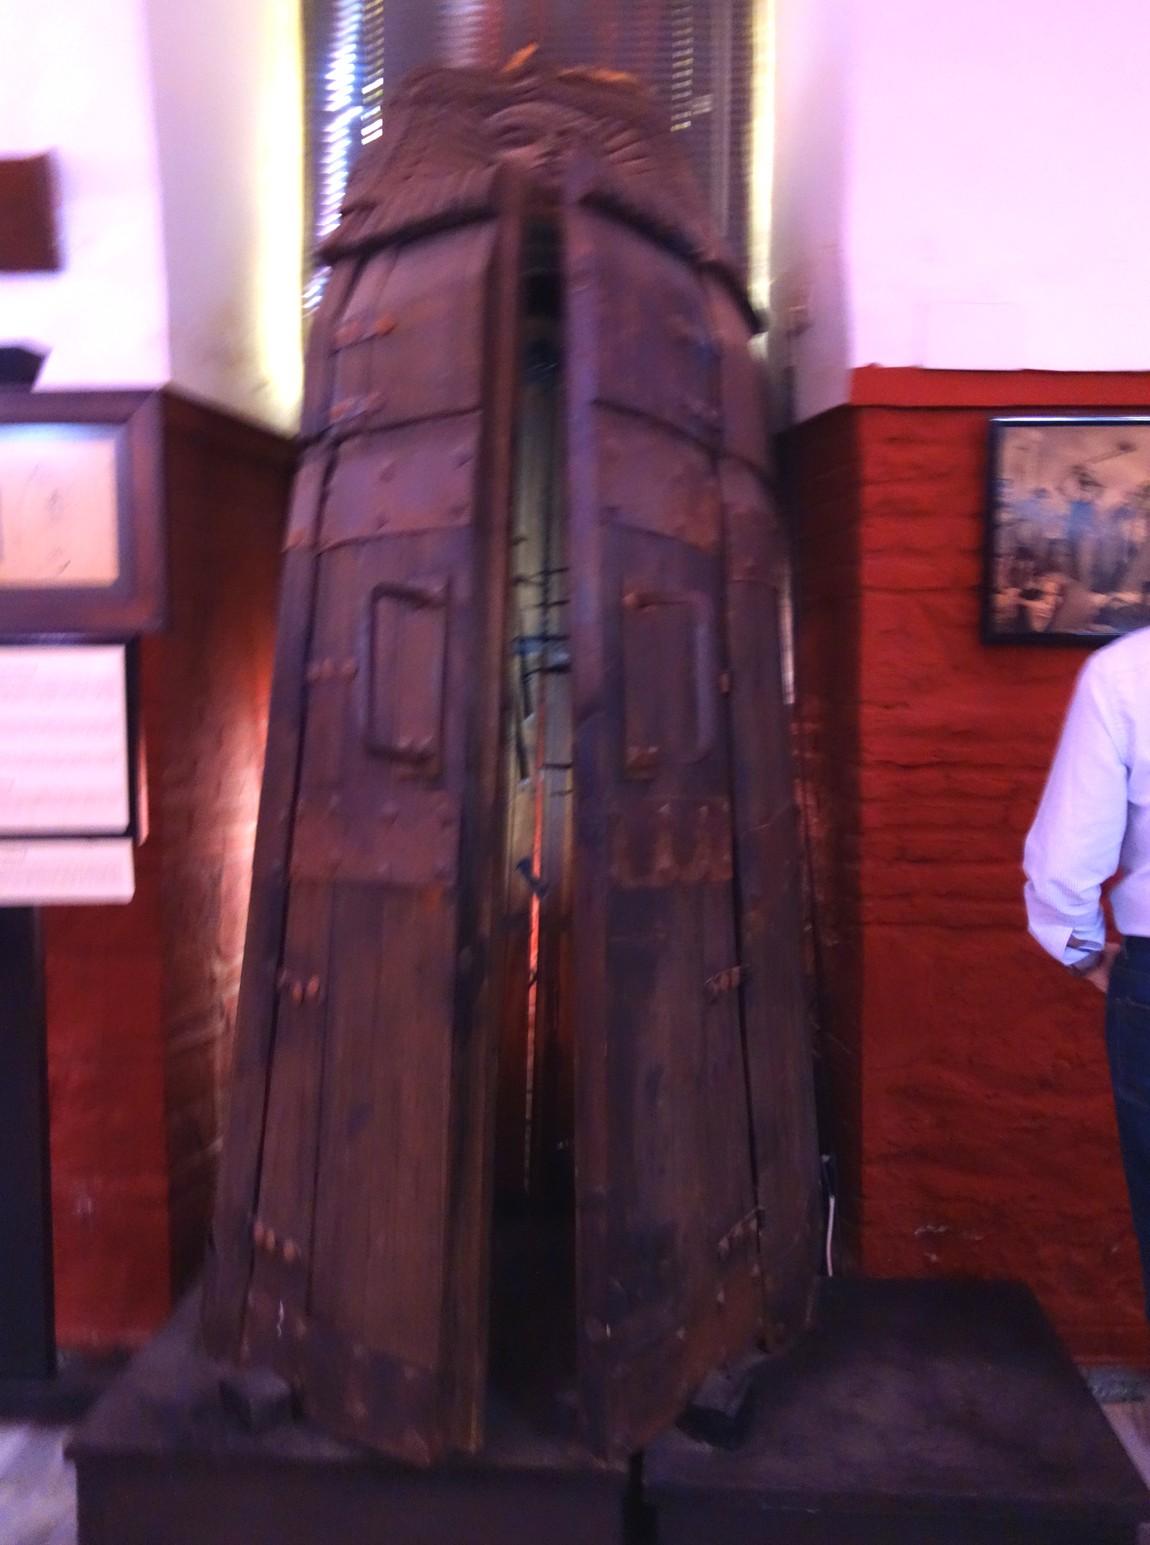 Музей инквизиции в Кордове